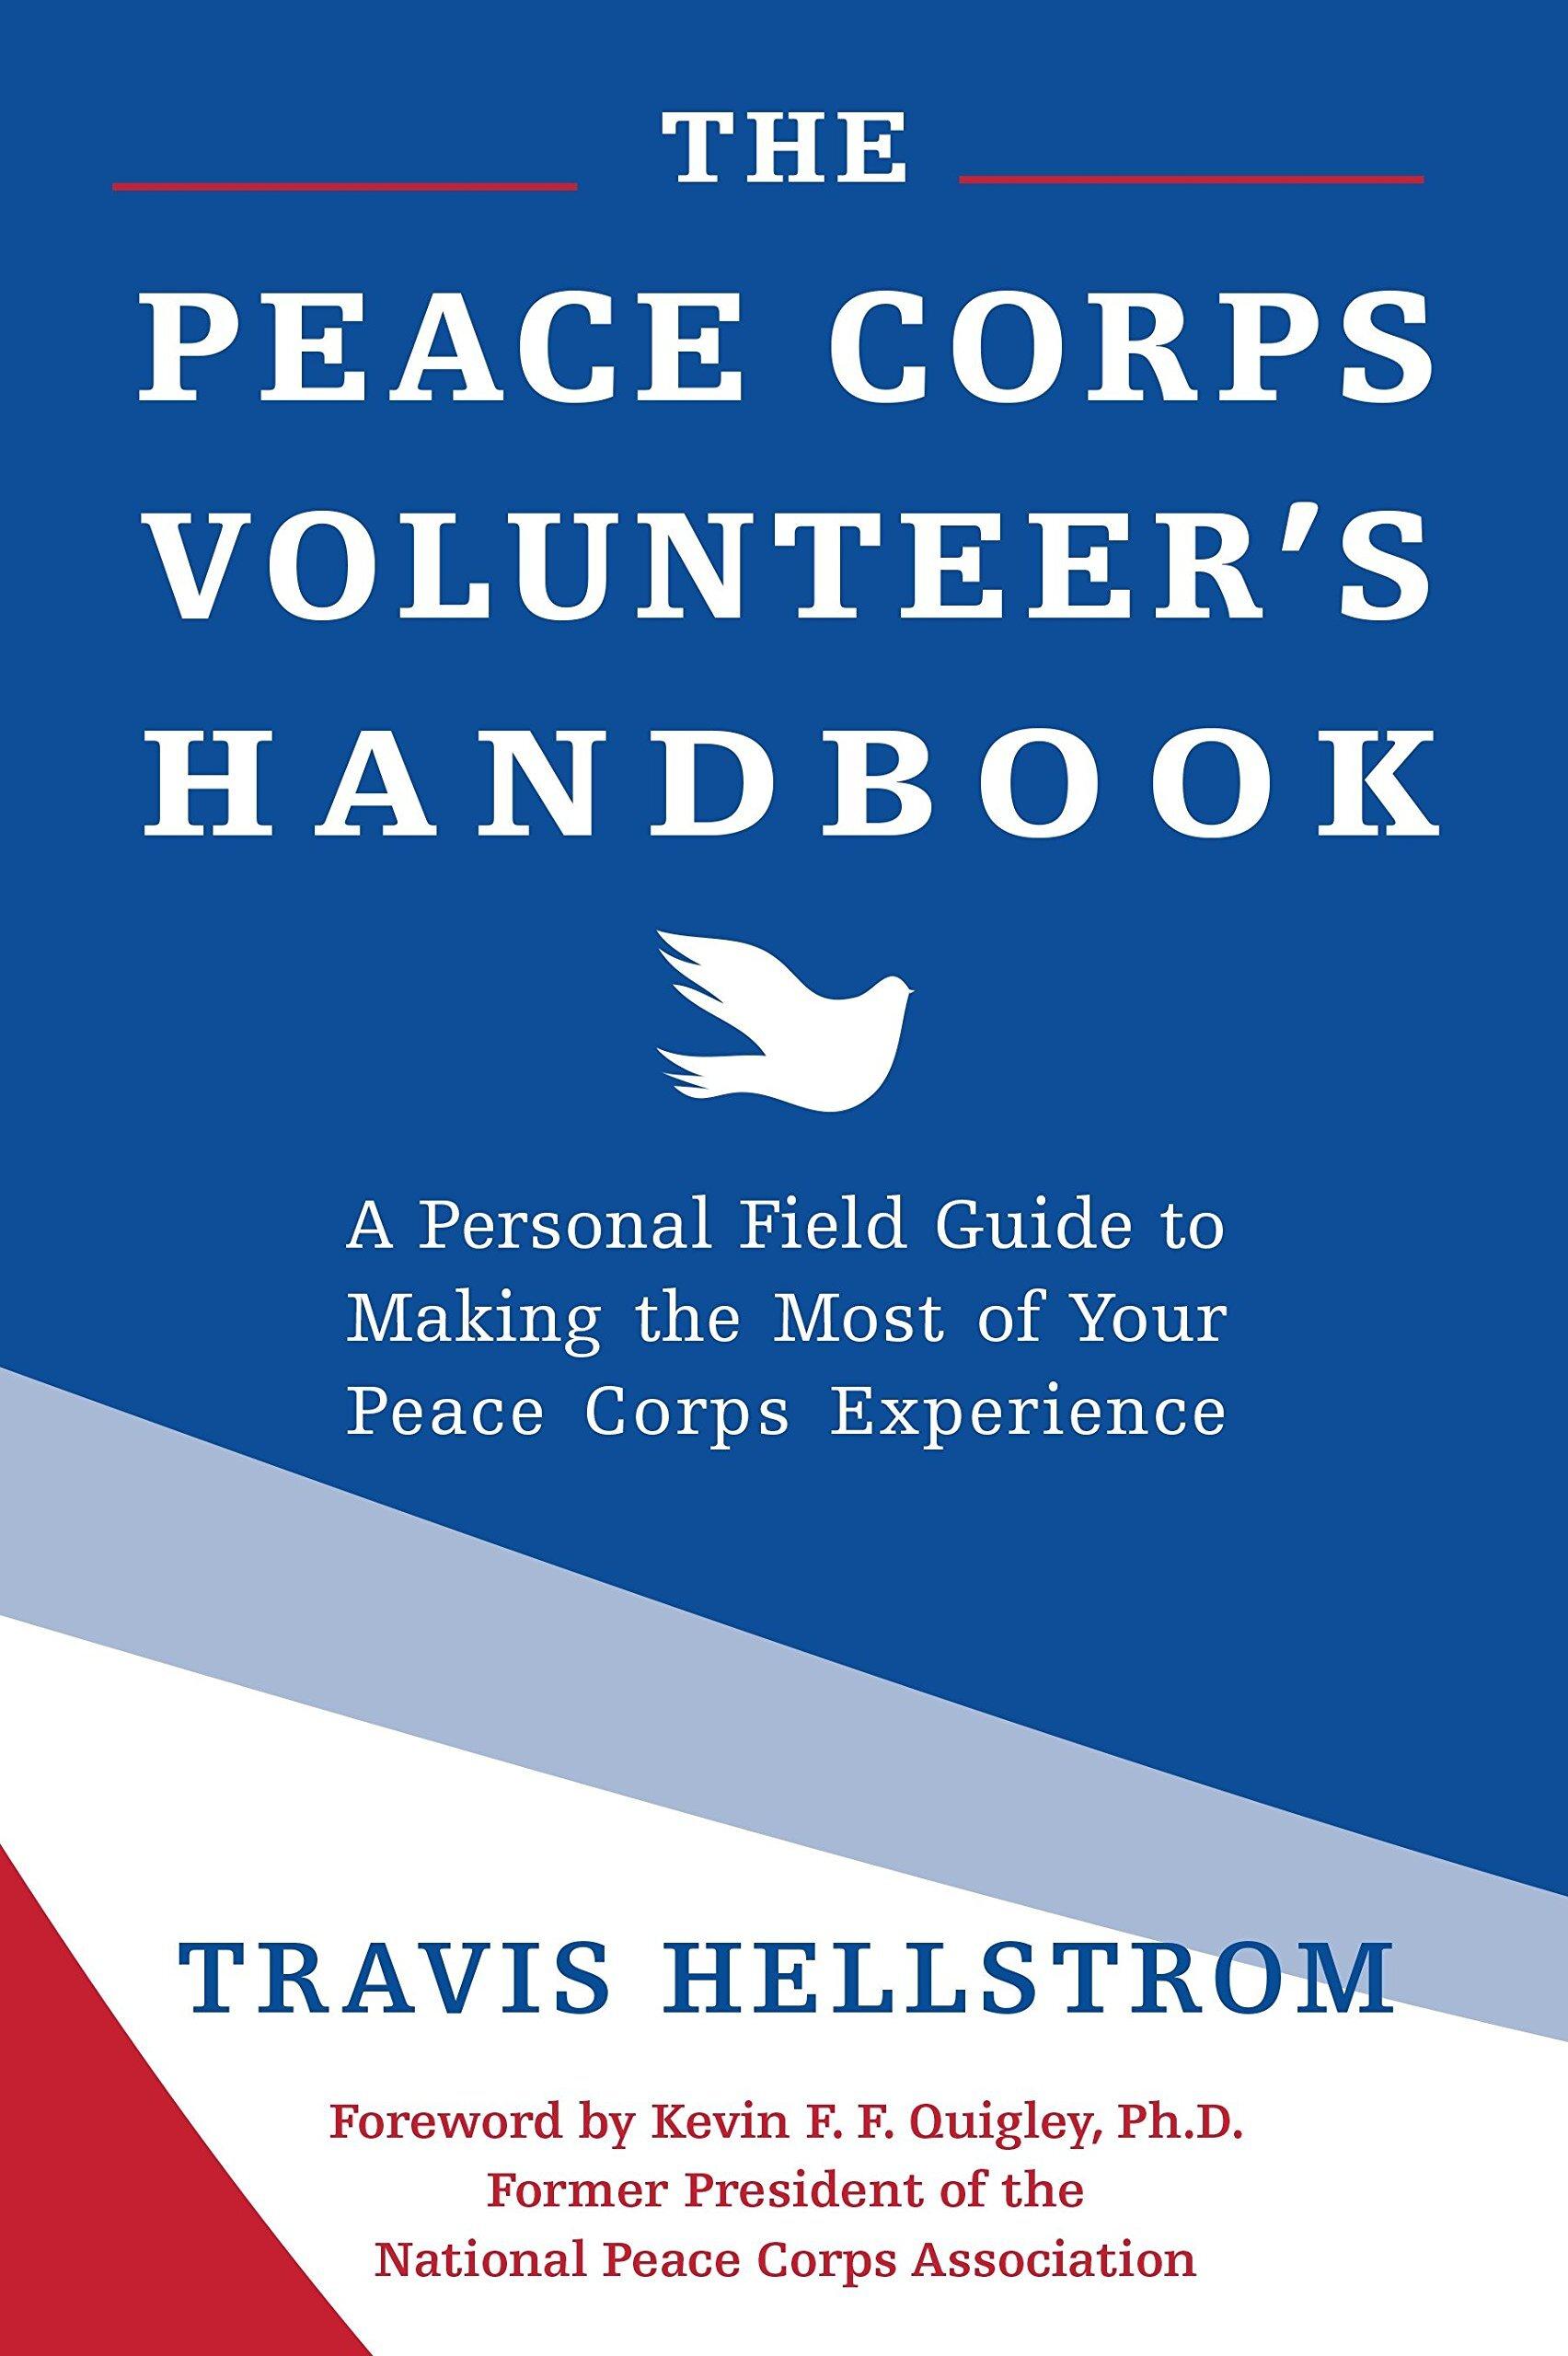 Peace Corps Handbook.jpg